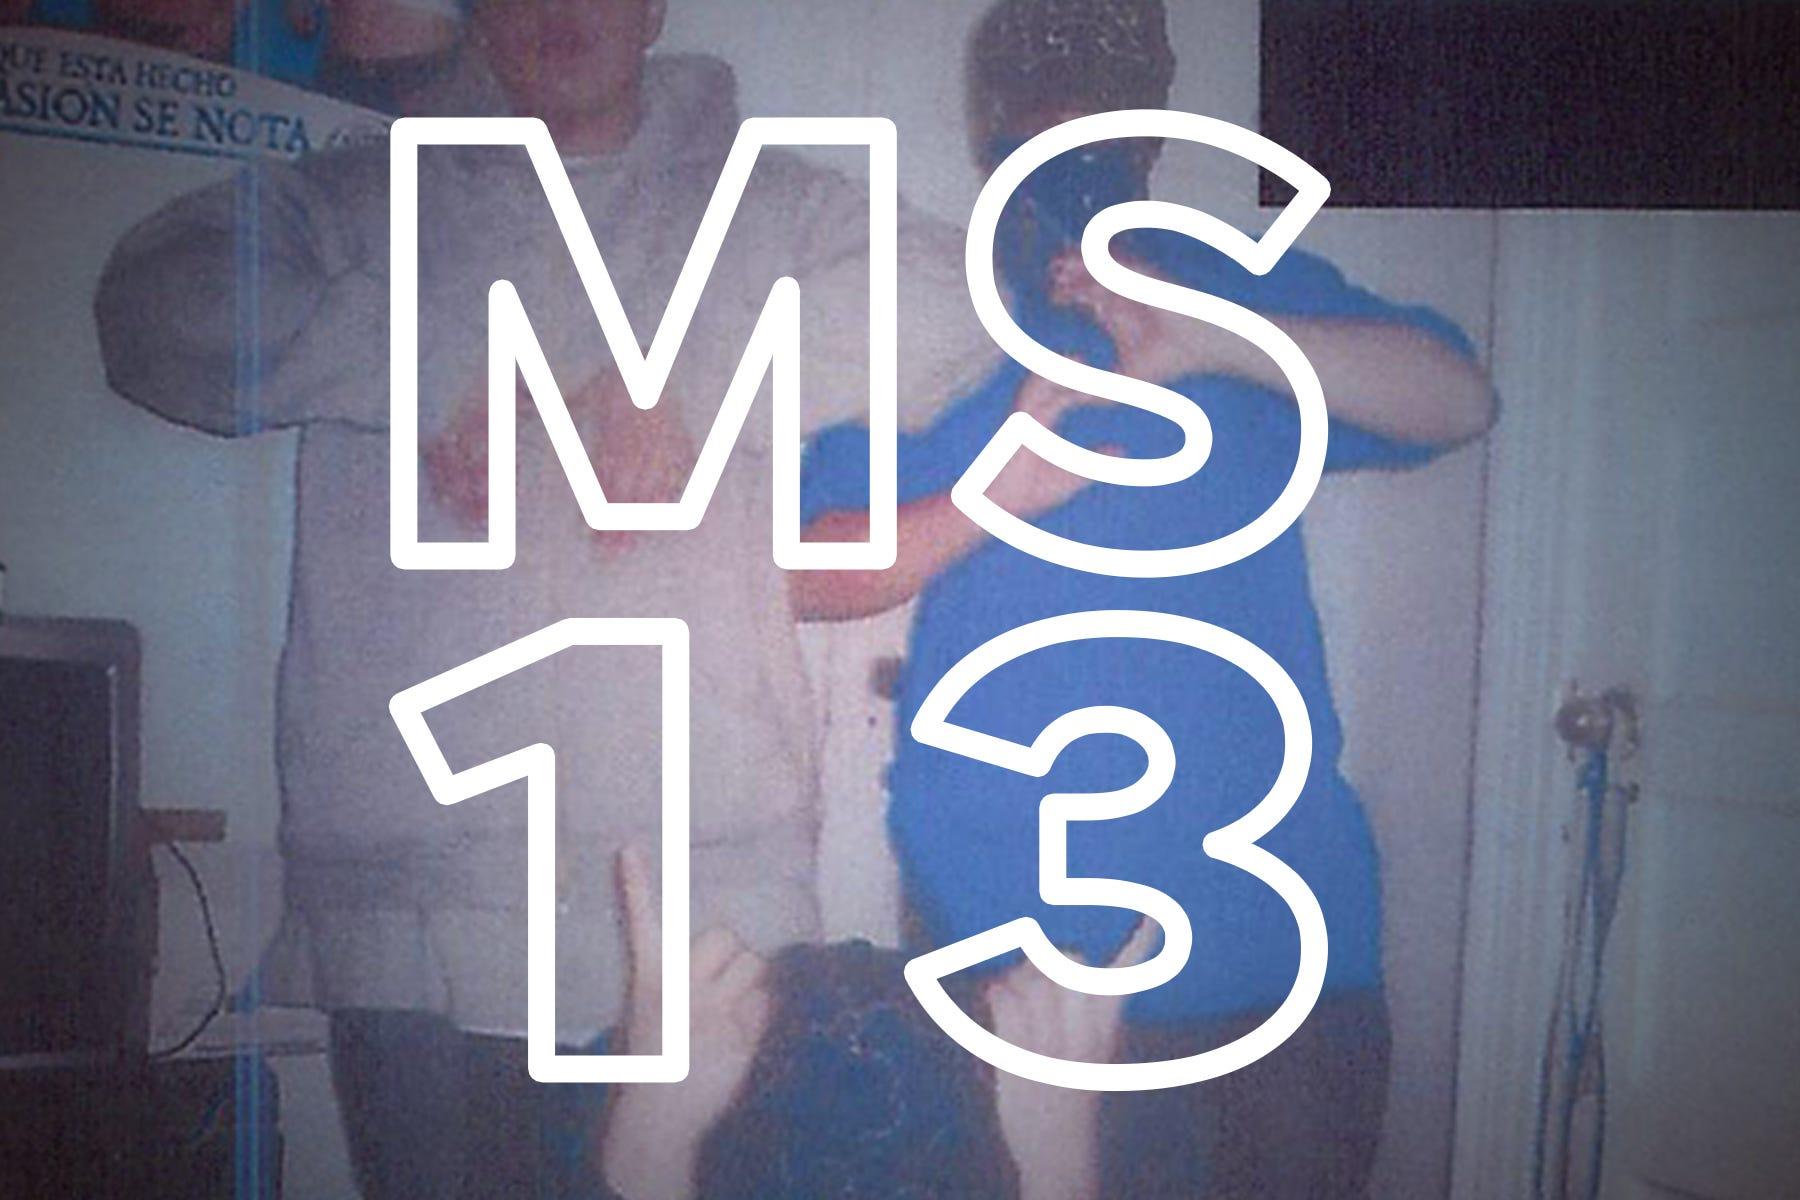 Ms 13 Promo Image